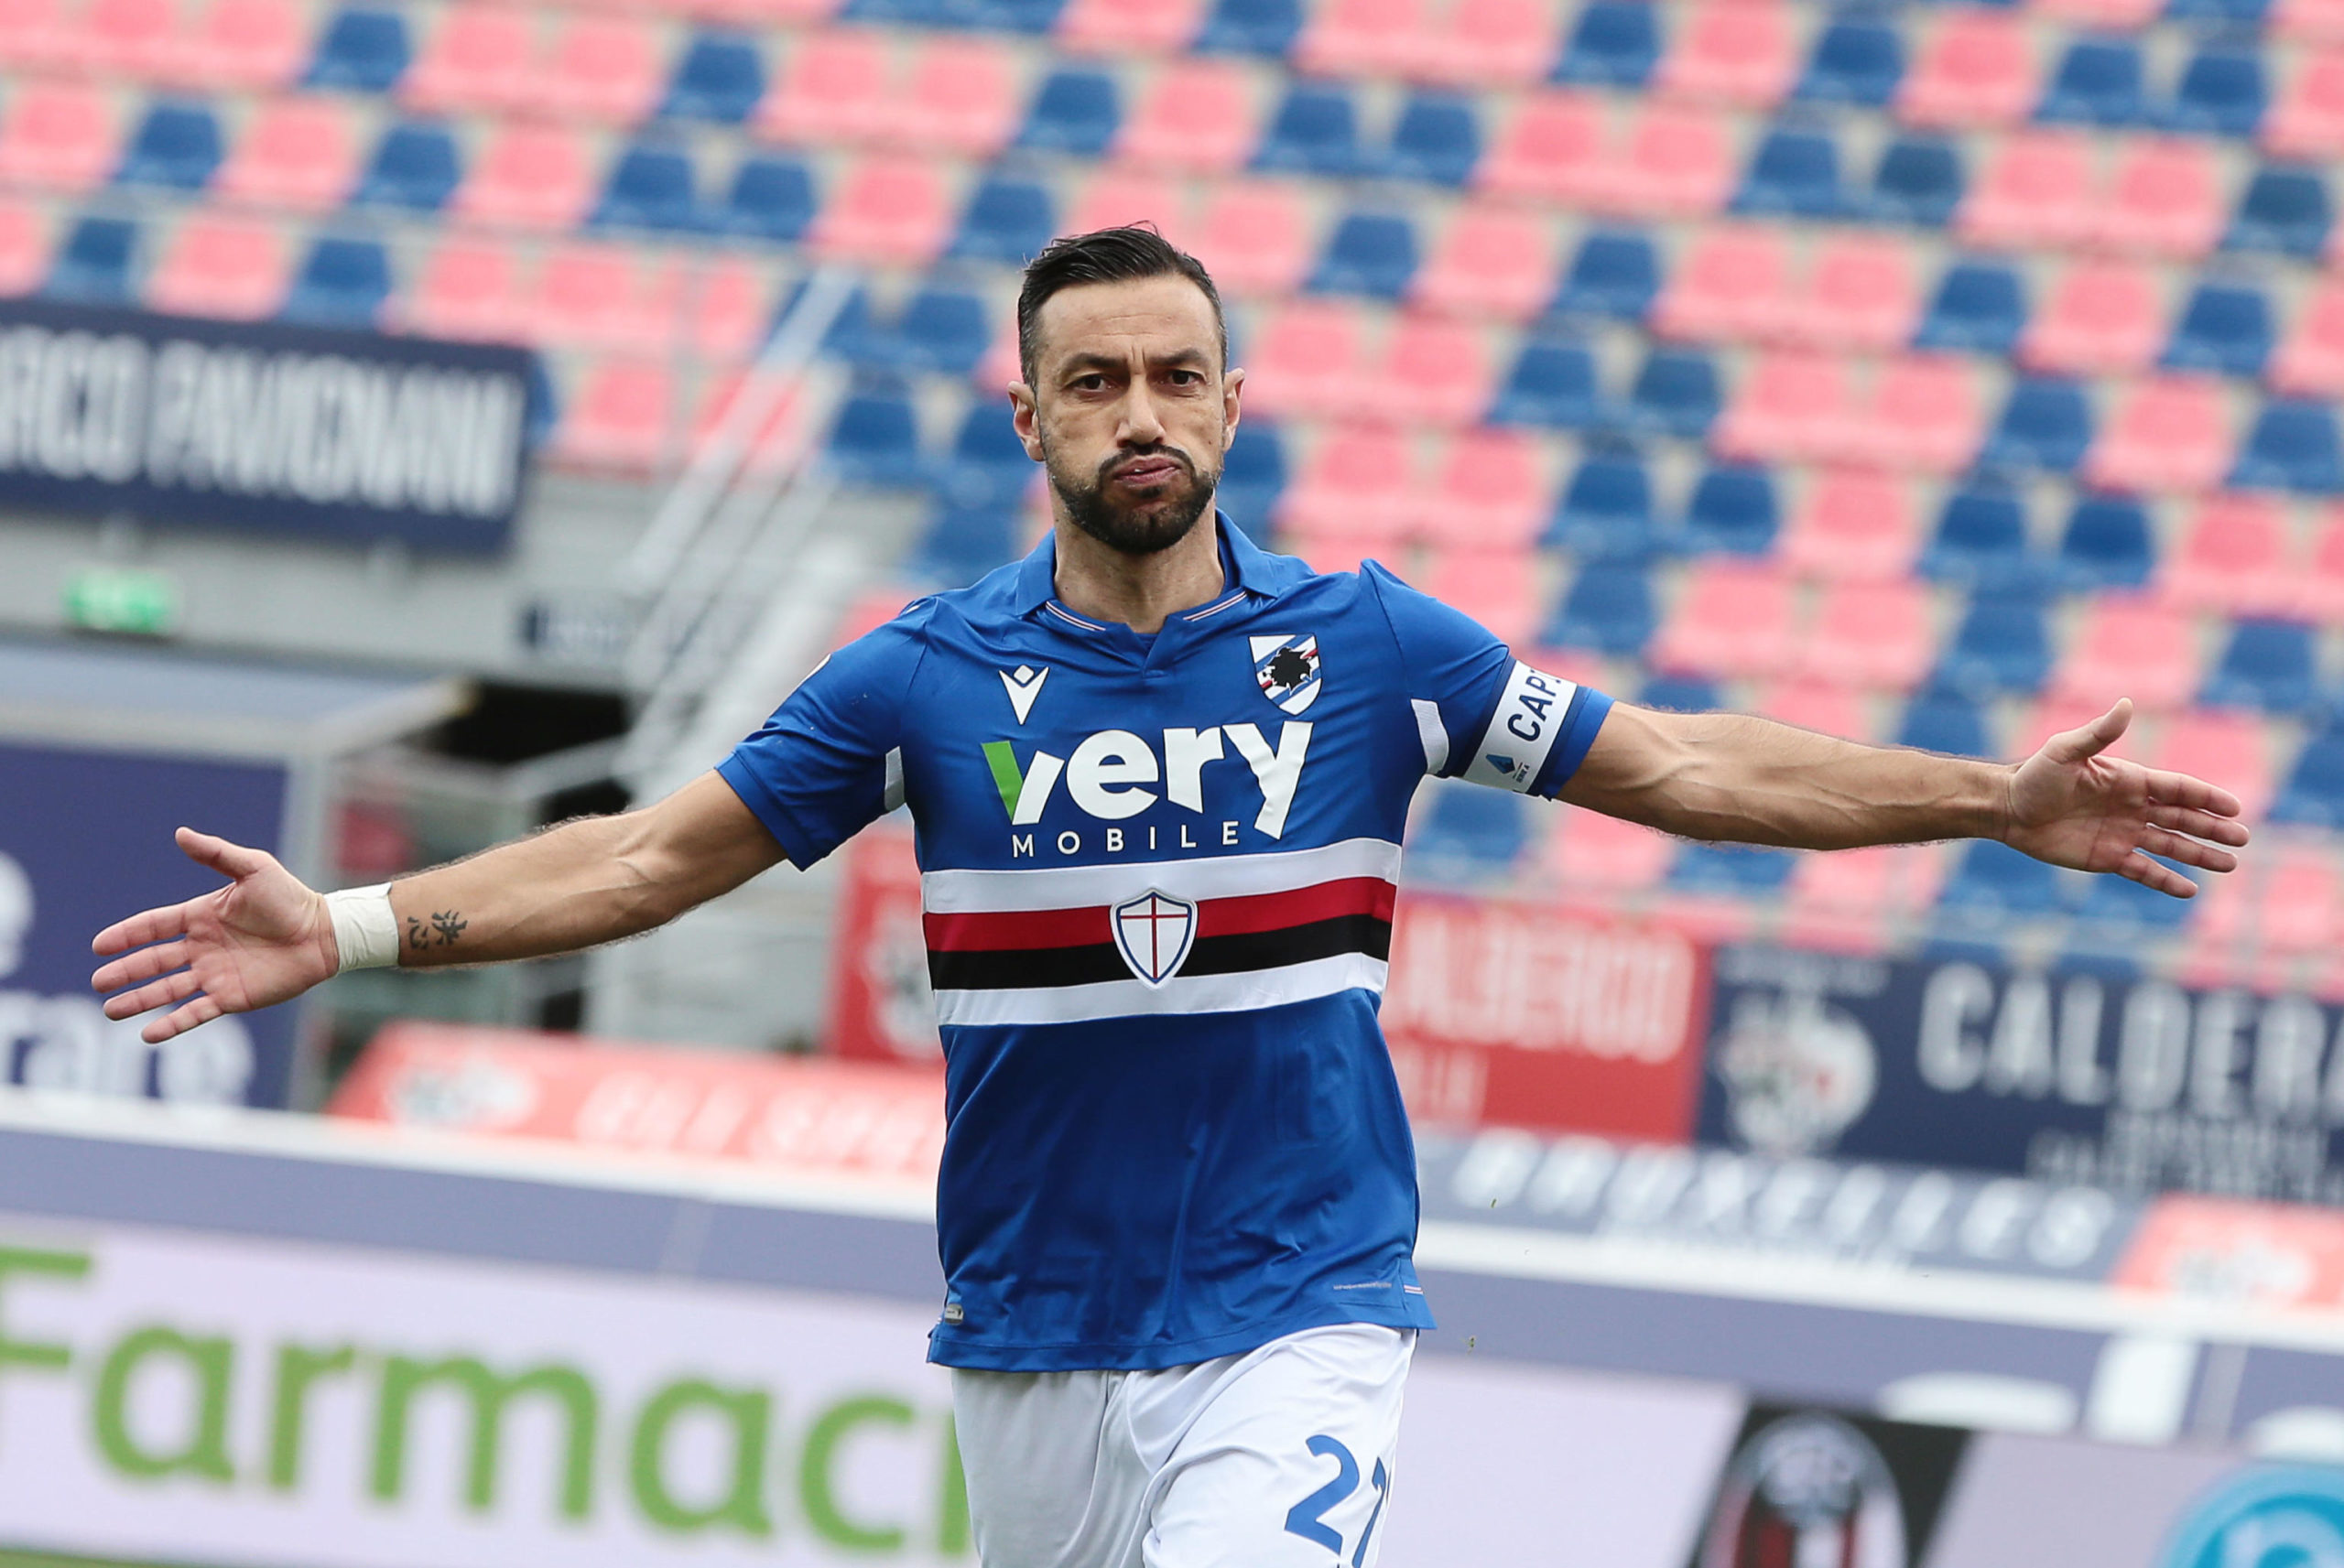 Fabio Quagliarella celebrates a goal